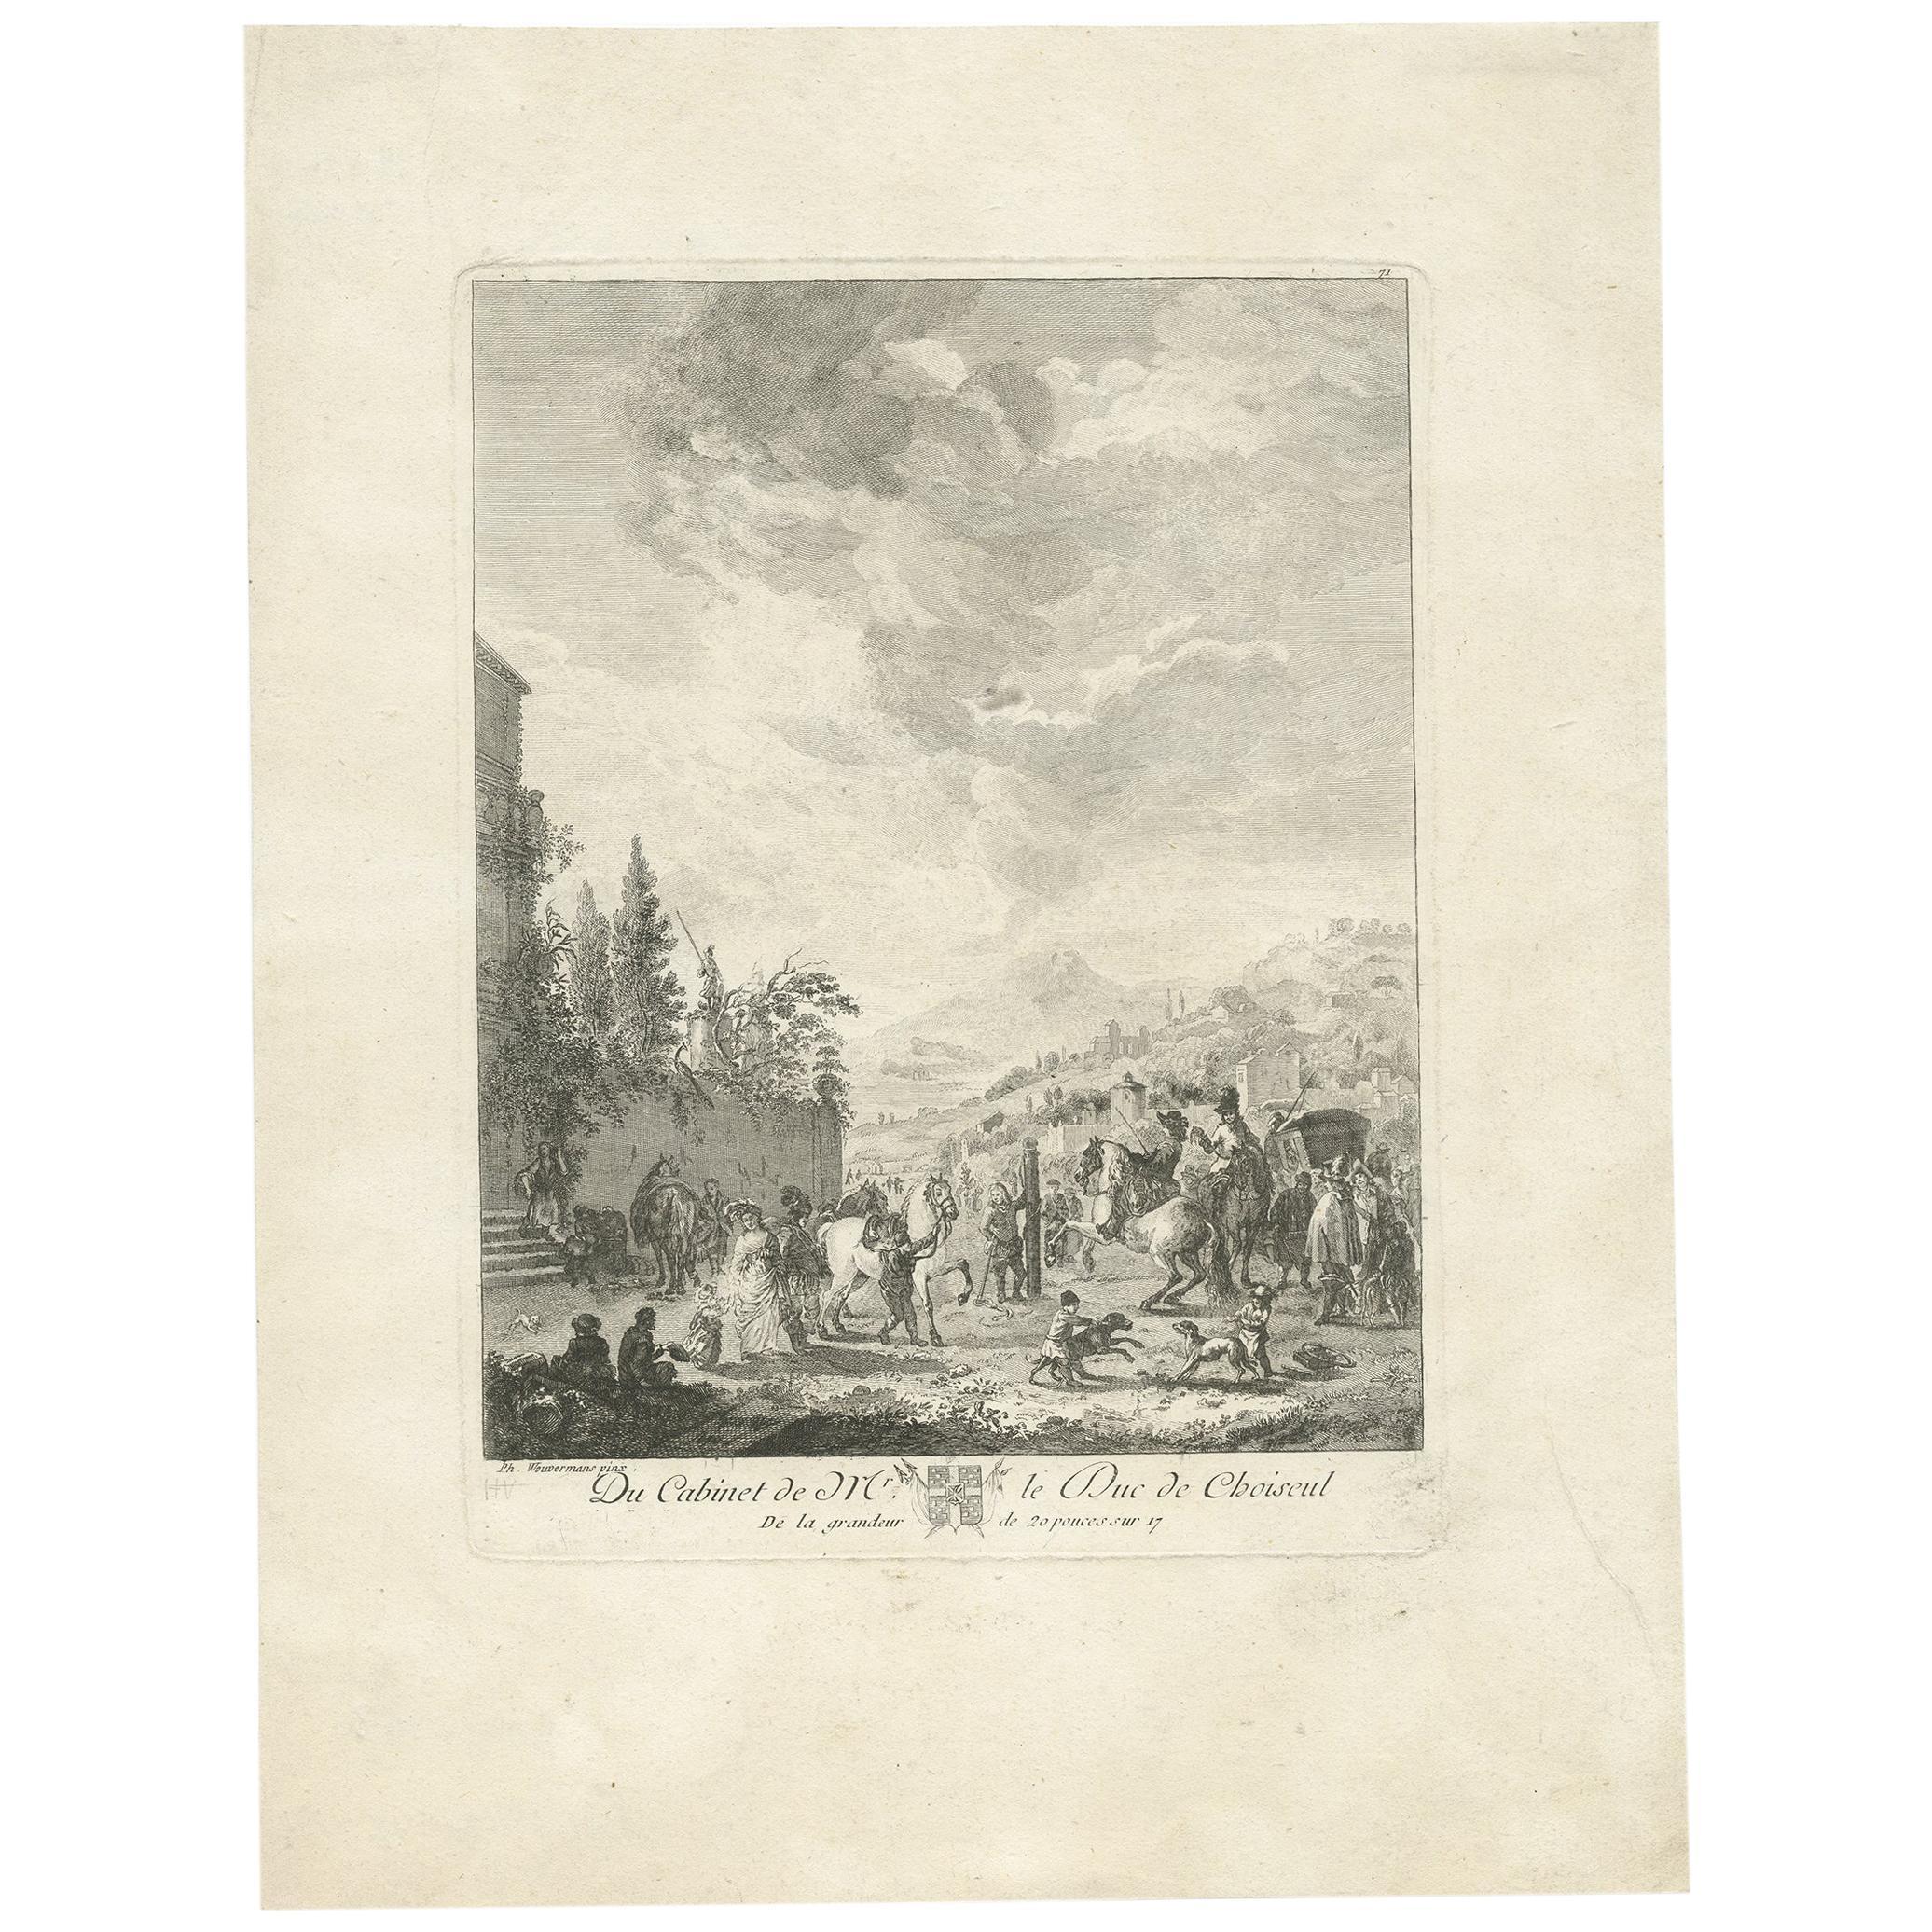 Antique Print of a Horse Fair Made after Wouwerman, 'circa 1780'